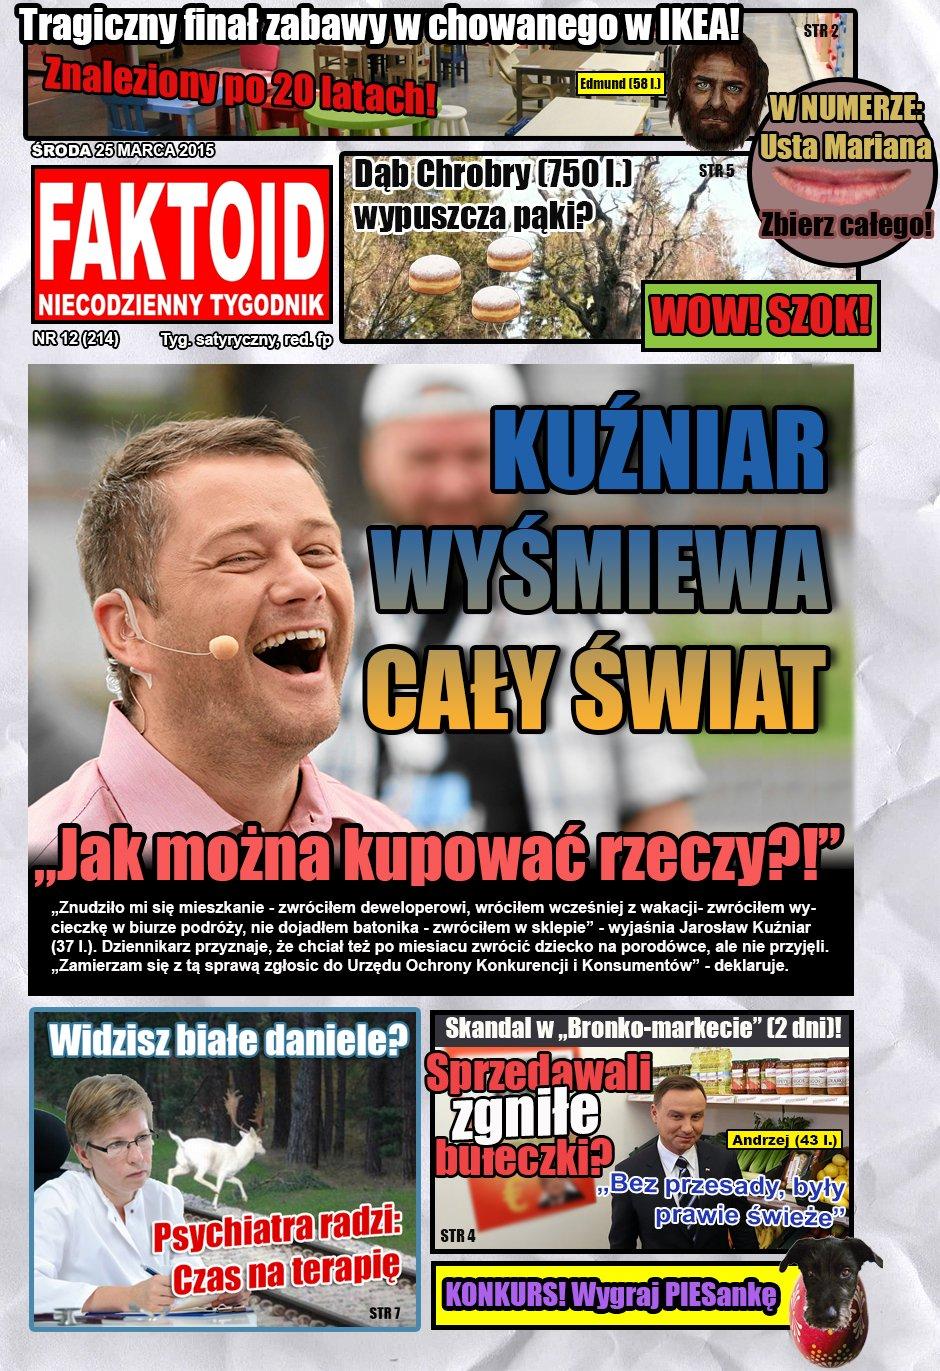 Faktoid, 25 marca, nr 12 (214)  - Gazeta.pl